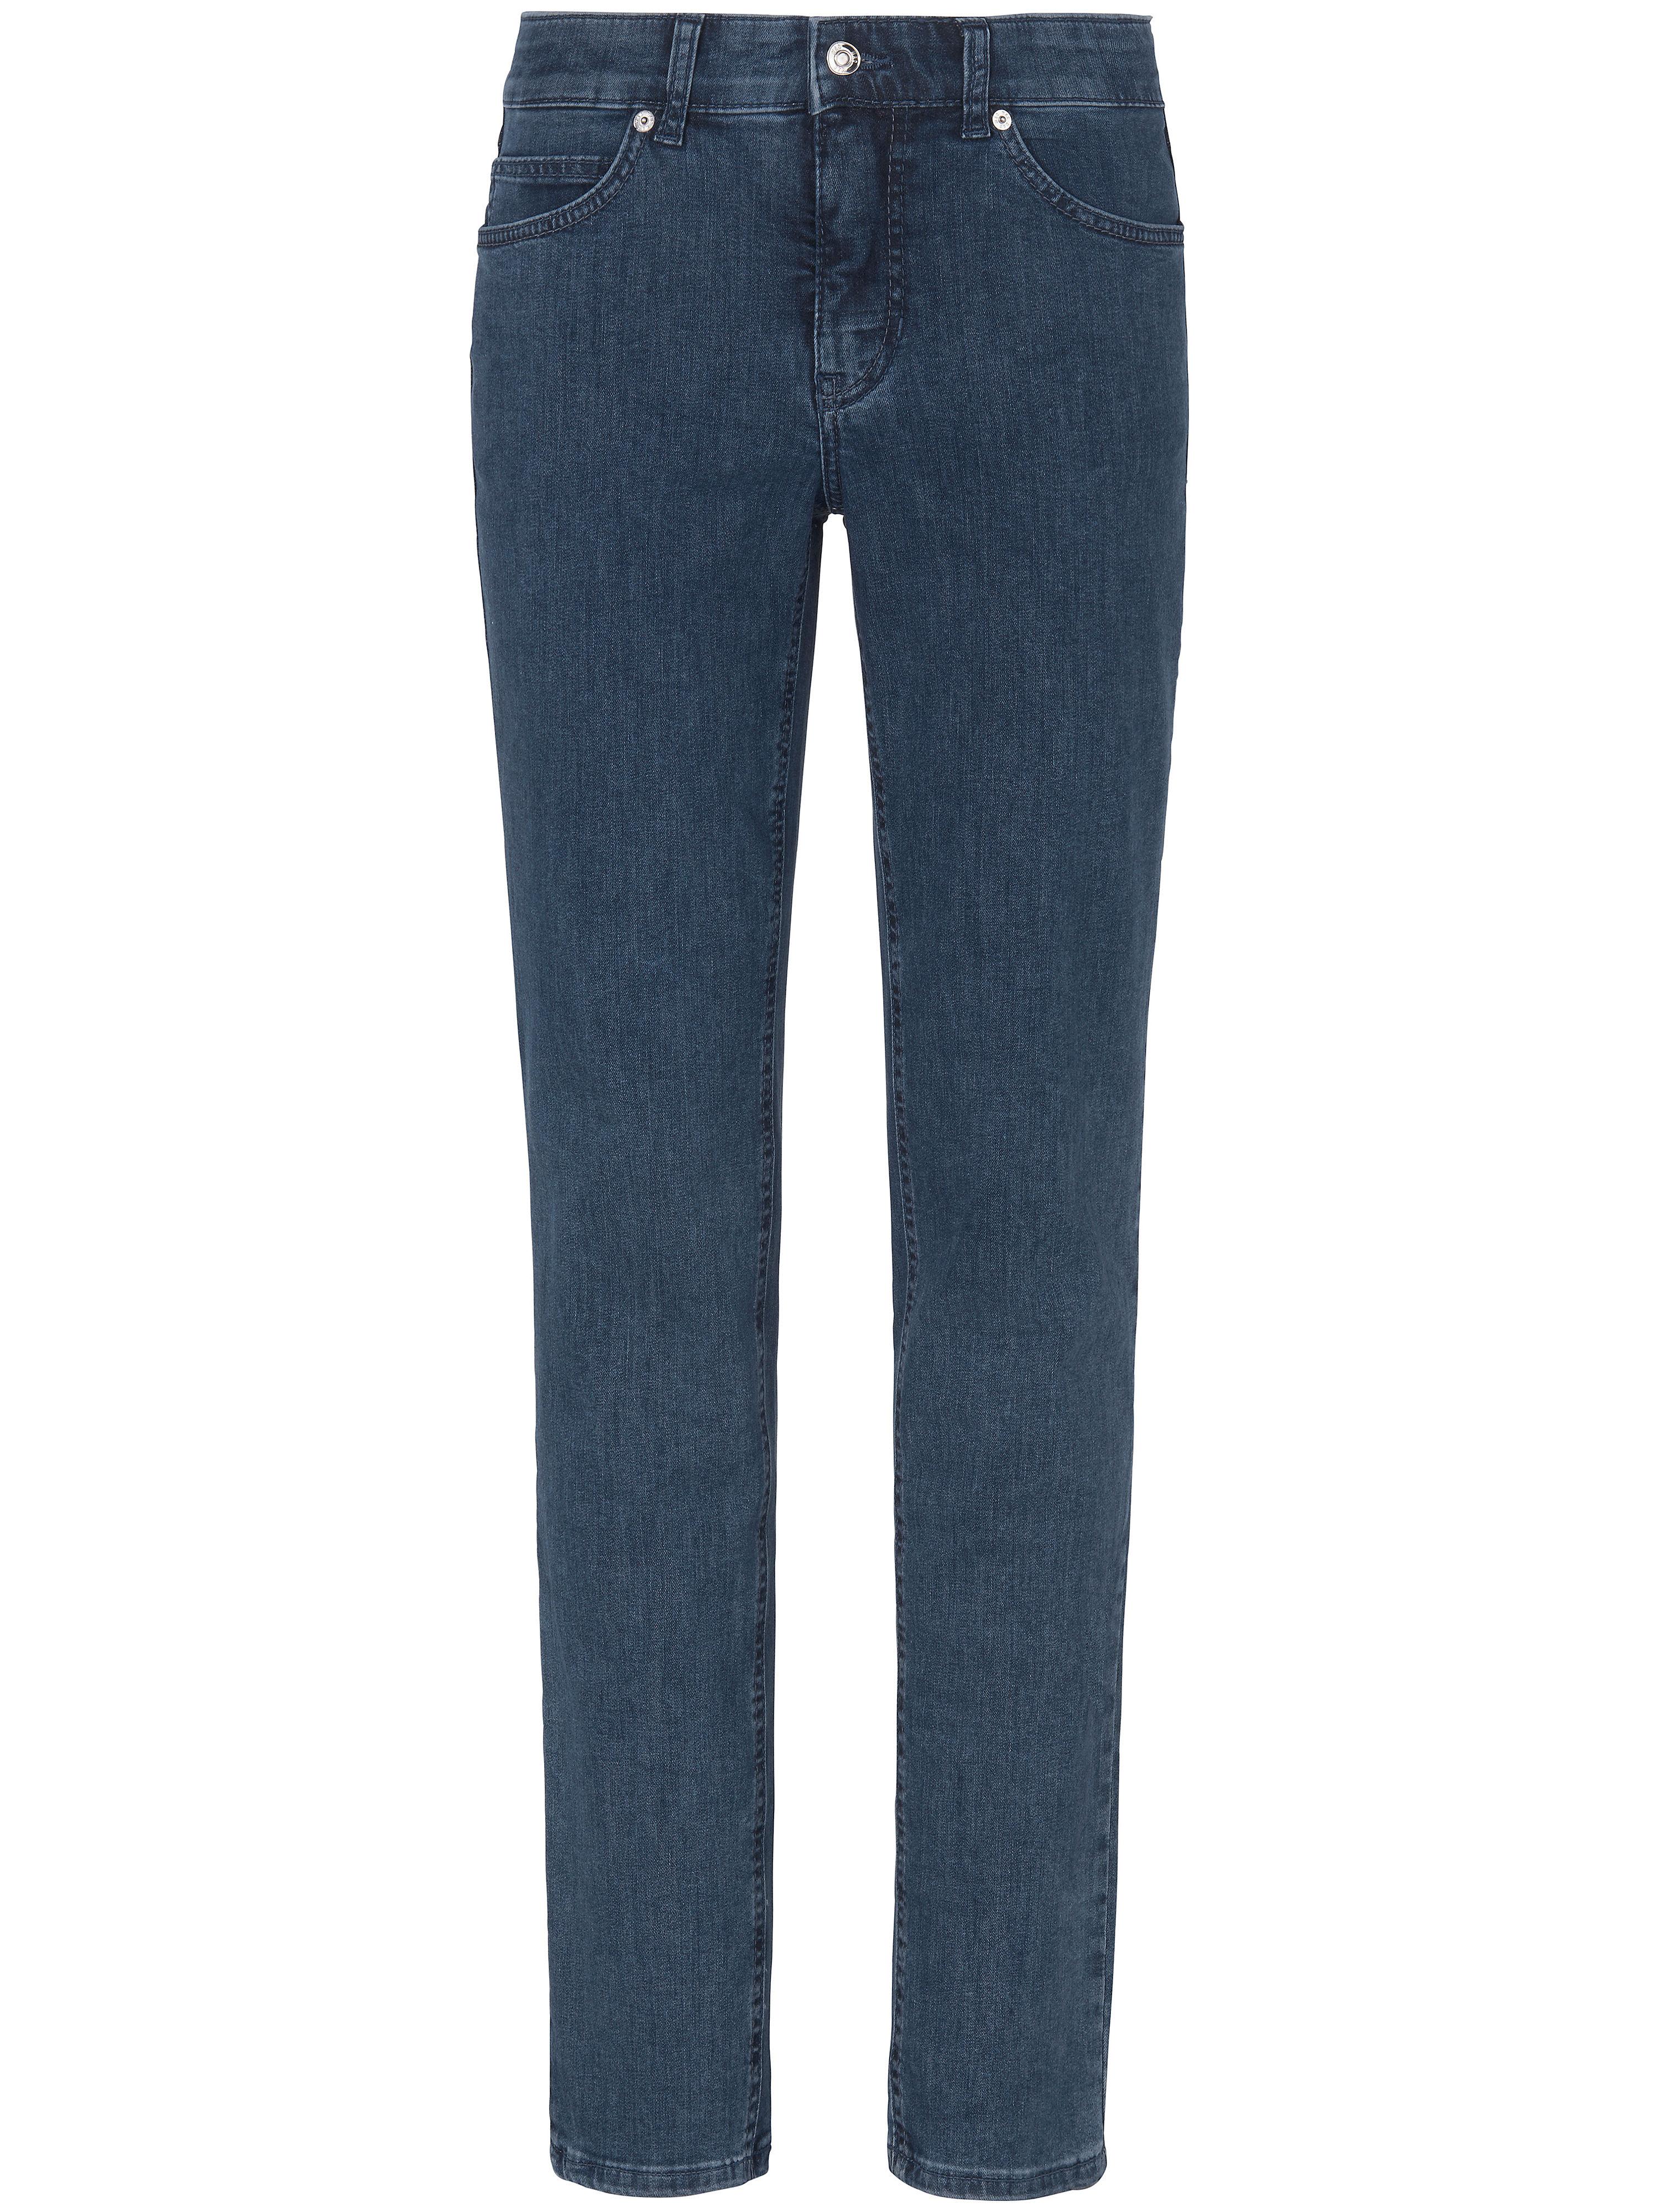 Image of   'Feminine Fit'-jeans Inch 30 Fra Mac denim